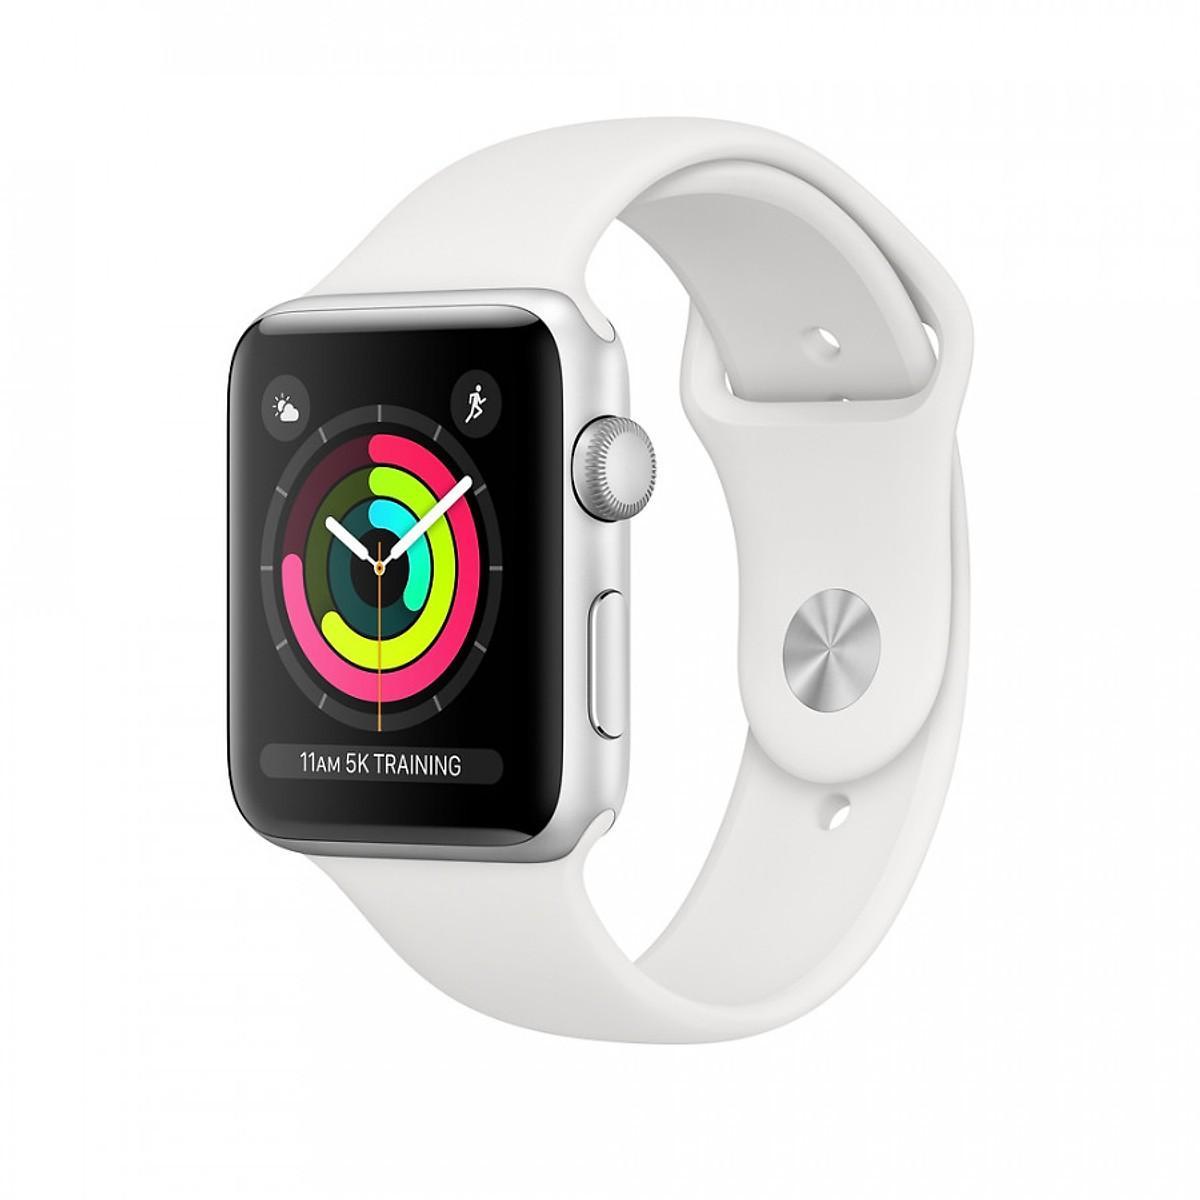 Đồng Hồ Thông Minh Apple Watch Series 3 GPS Aluminium Case With Sport Band